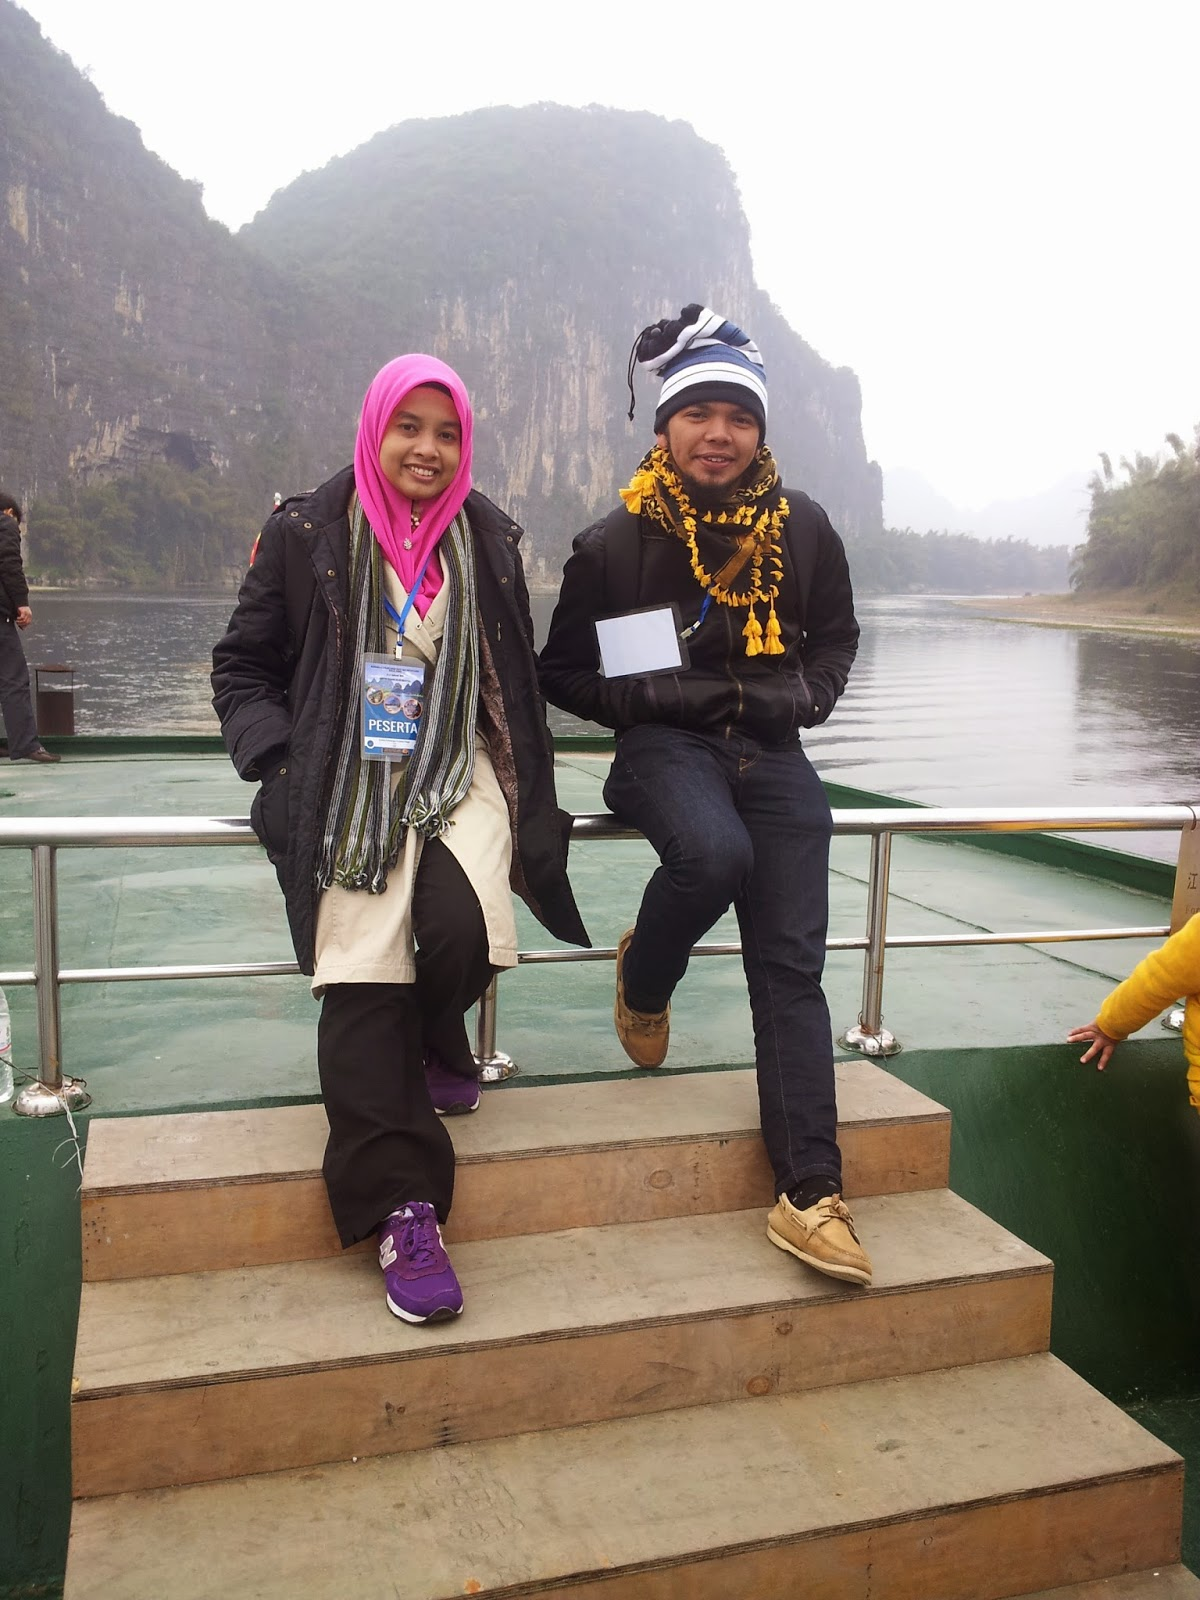 adkdayah, giso, u3p, usim, cruise li river, aswadi